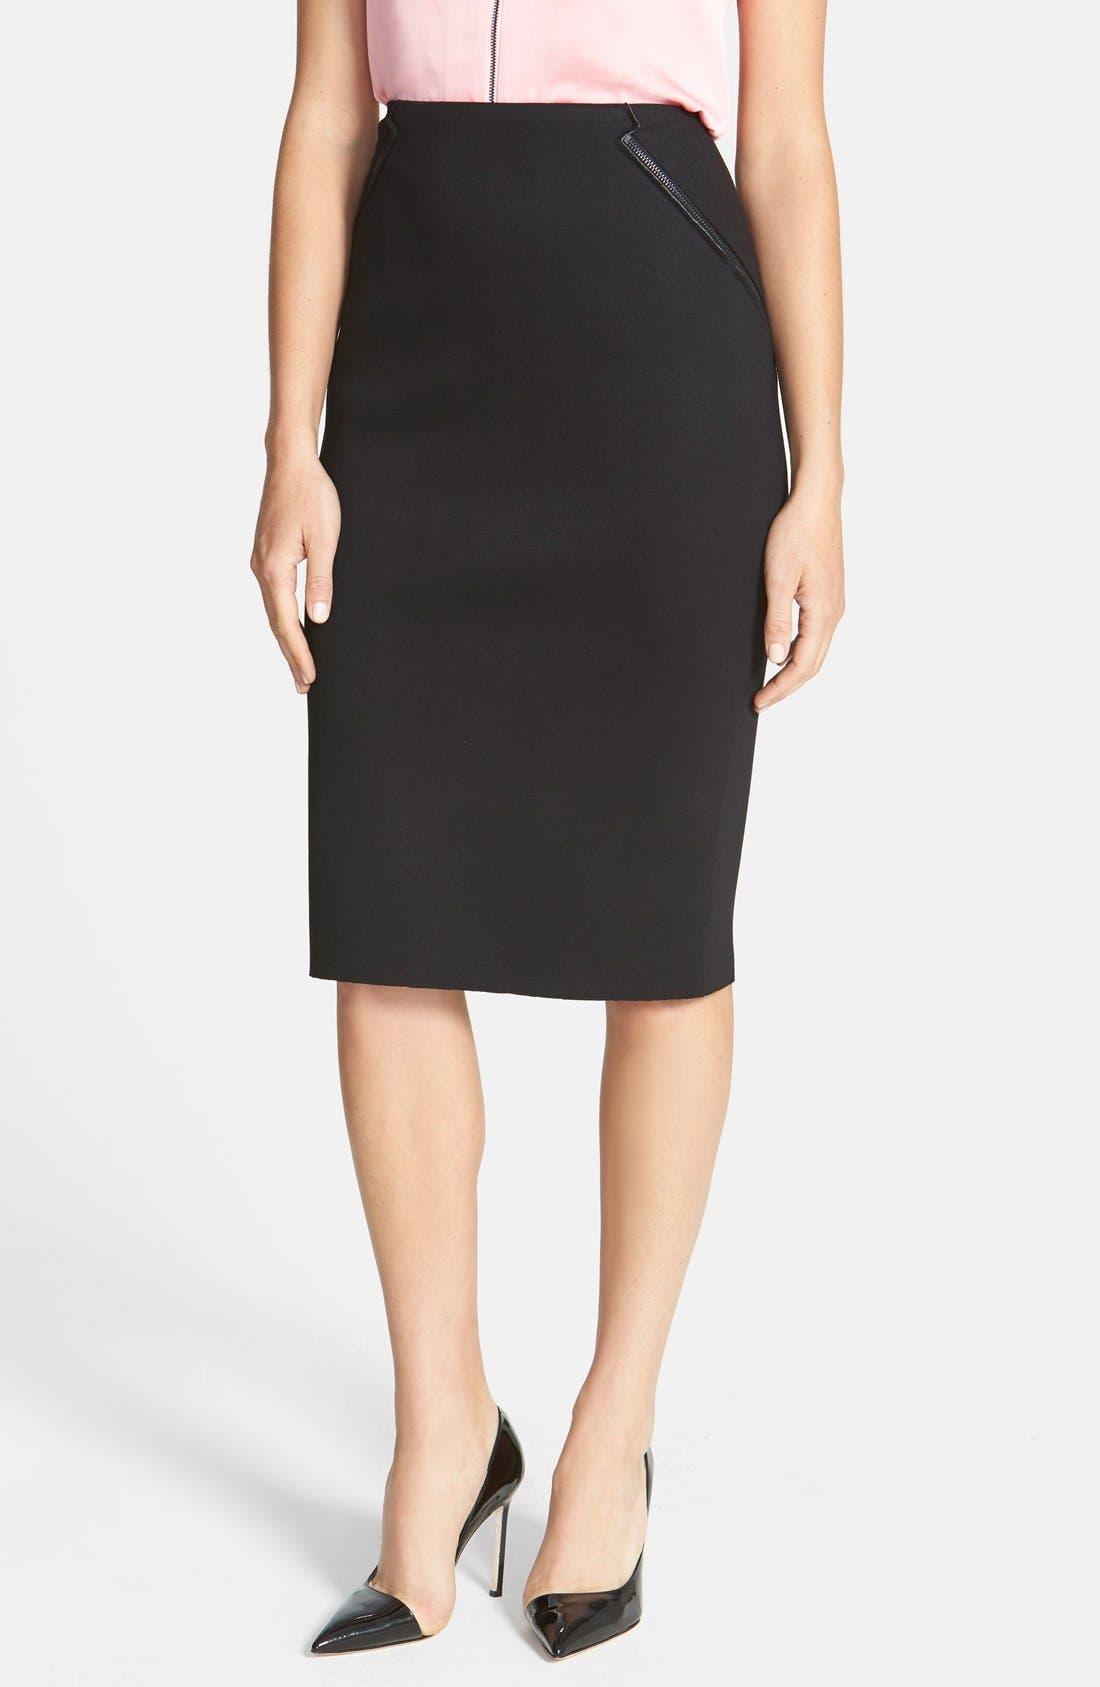 Alternate Image 1 Selected - Elie Tahari 'Harla' Knit Skirt